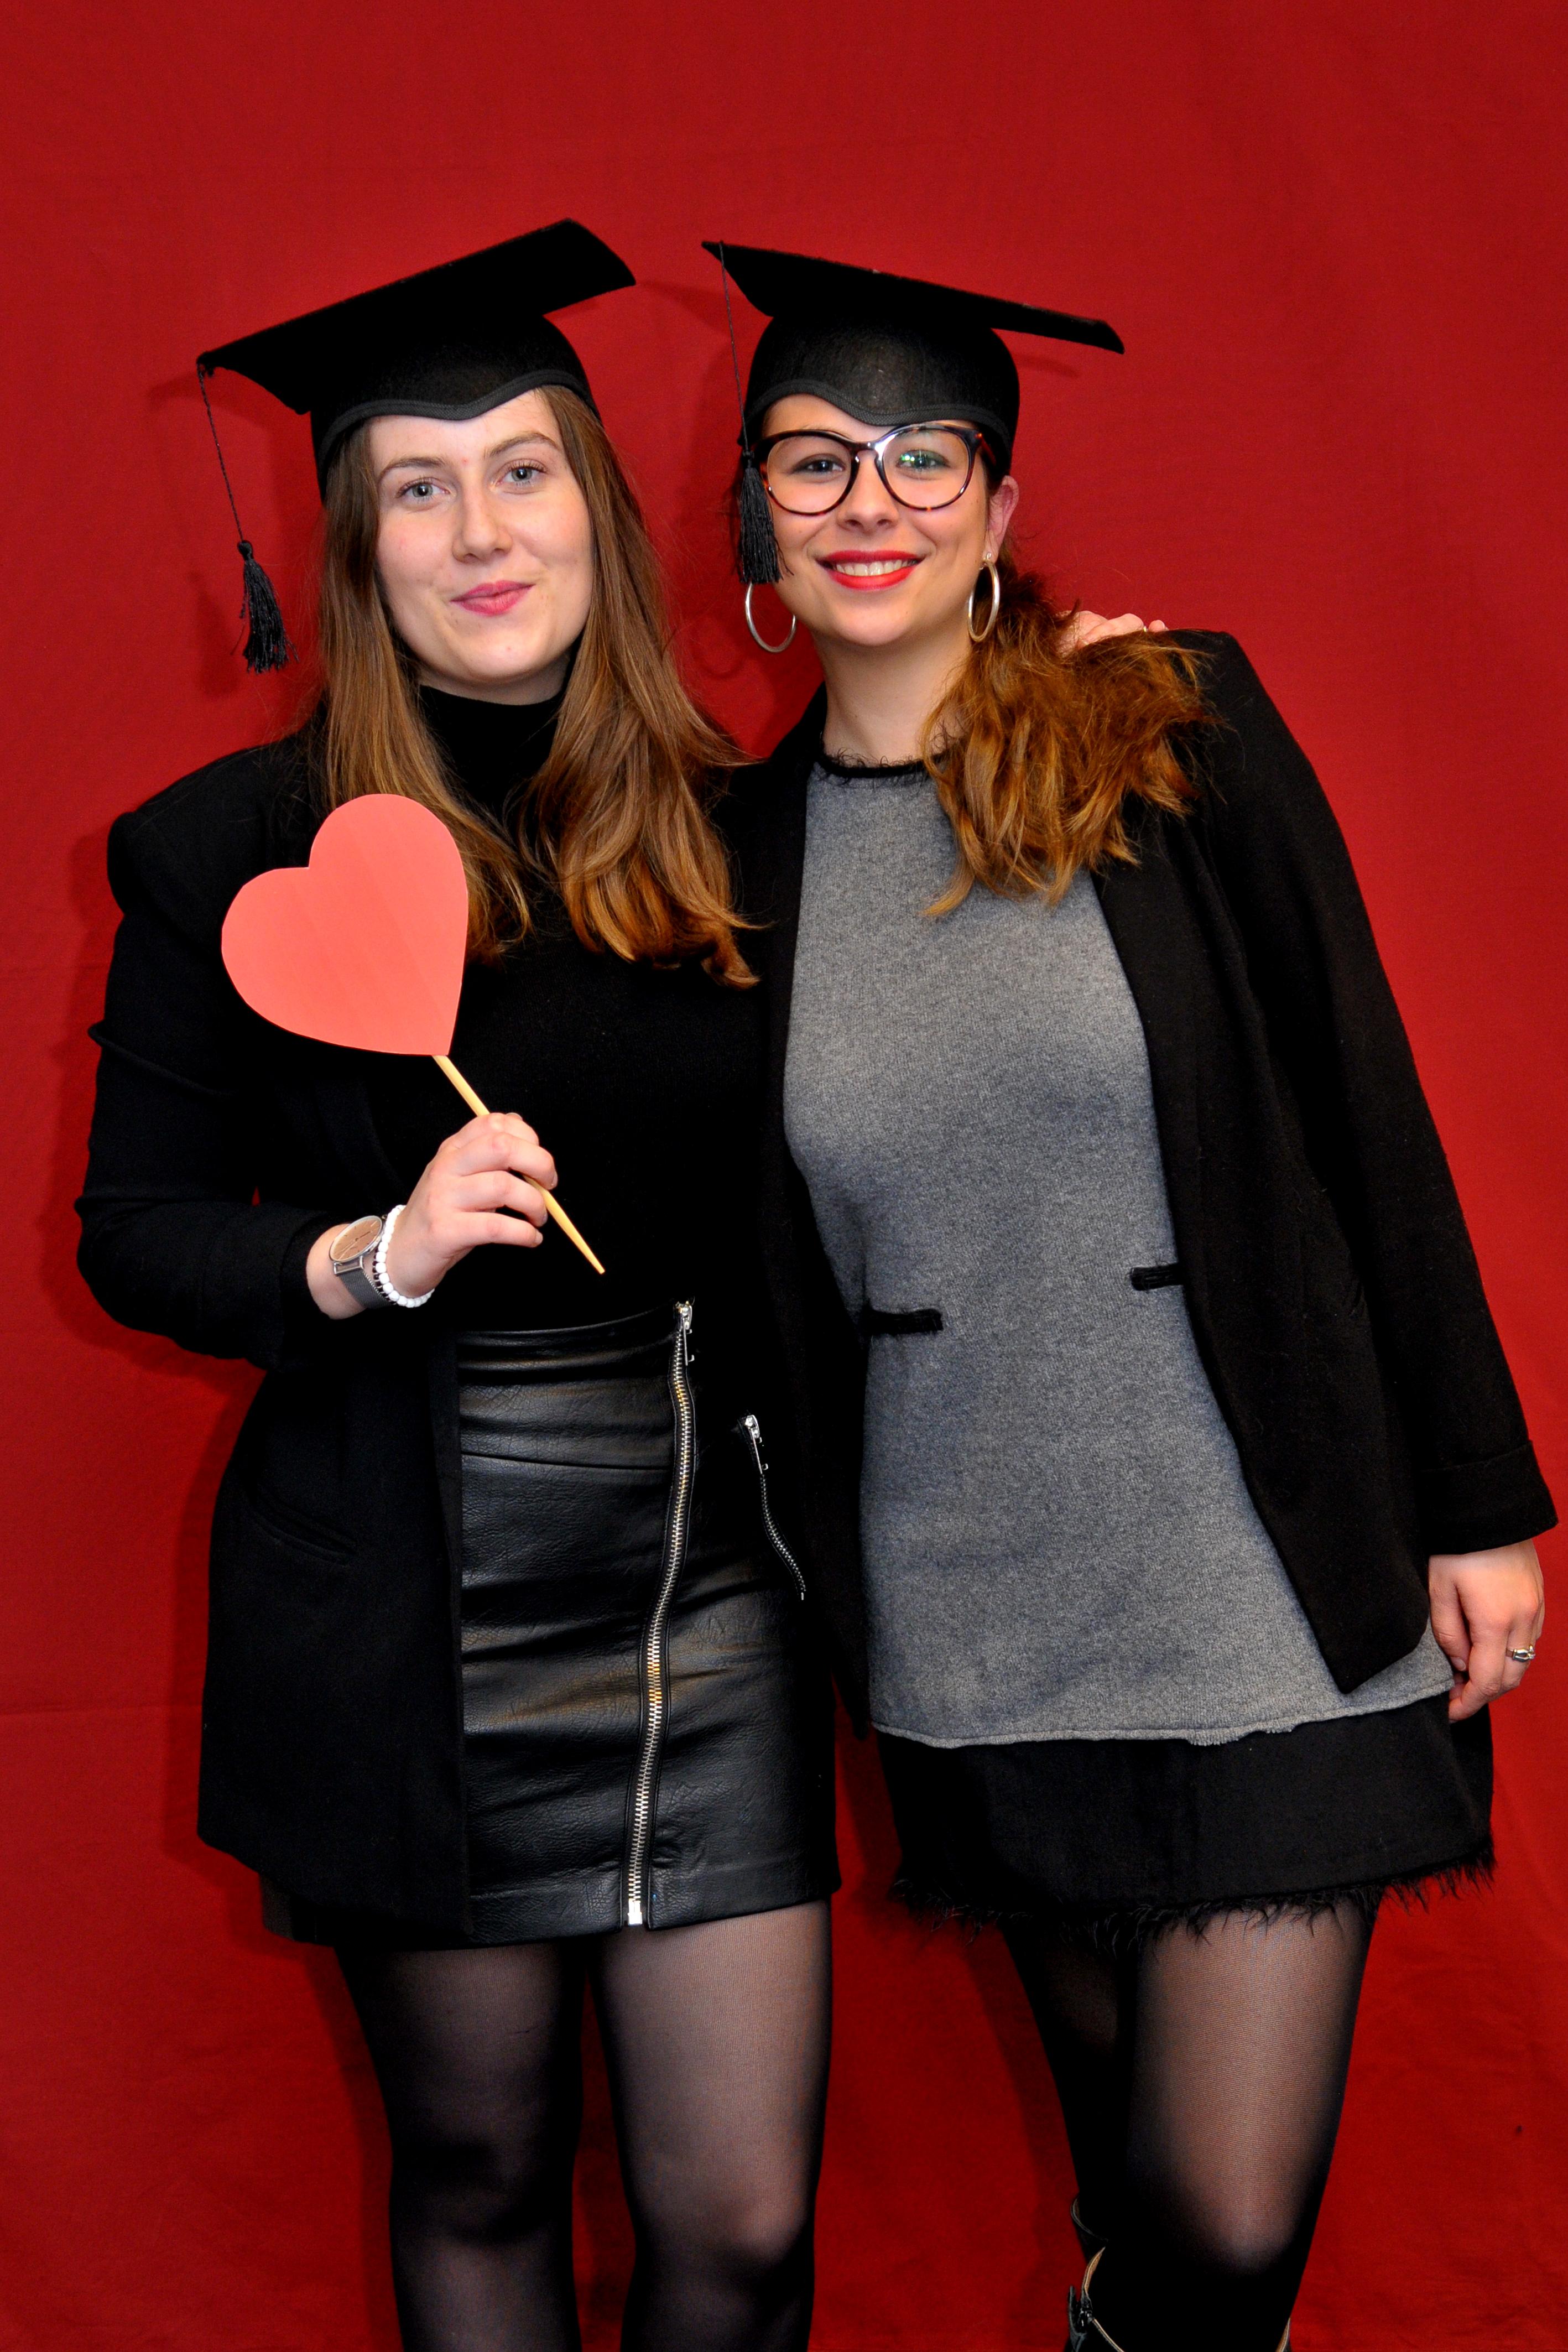 Remise des diplomes158